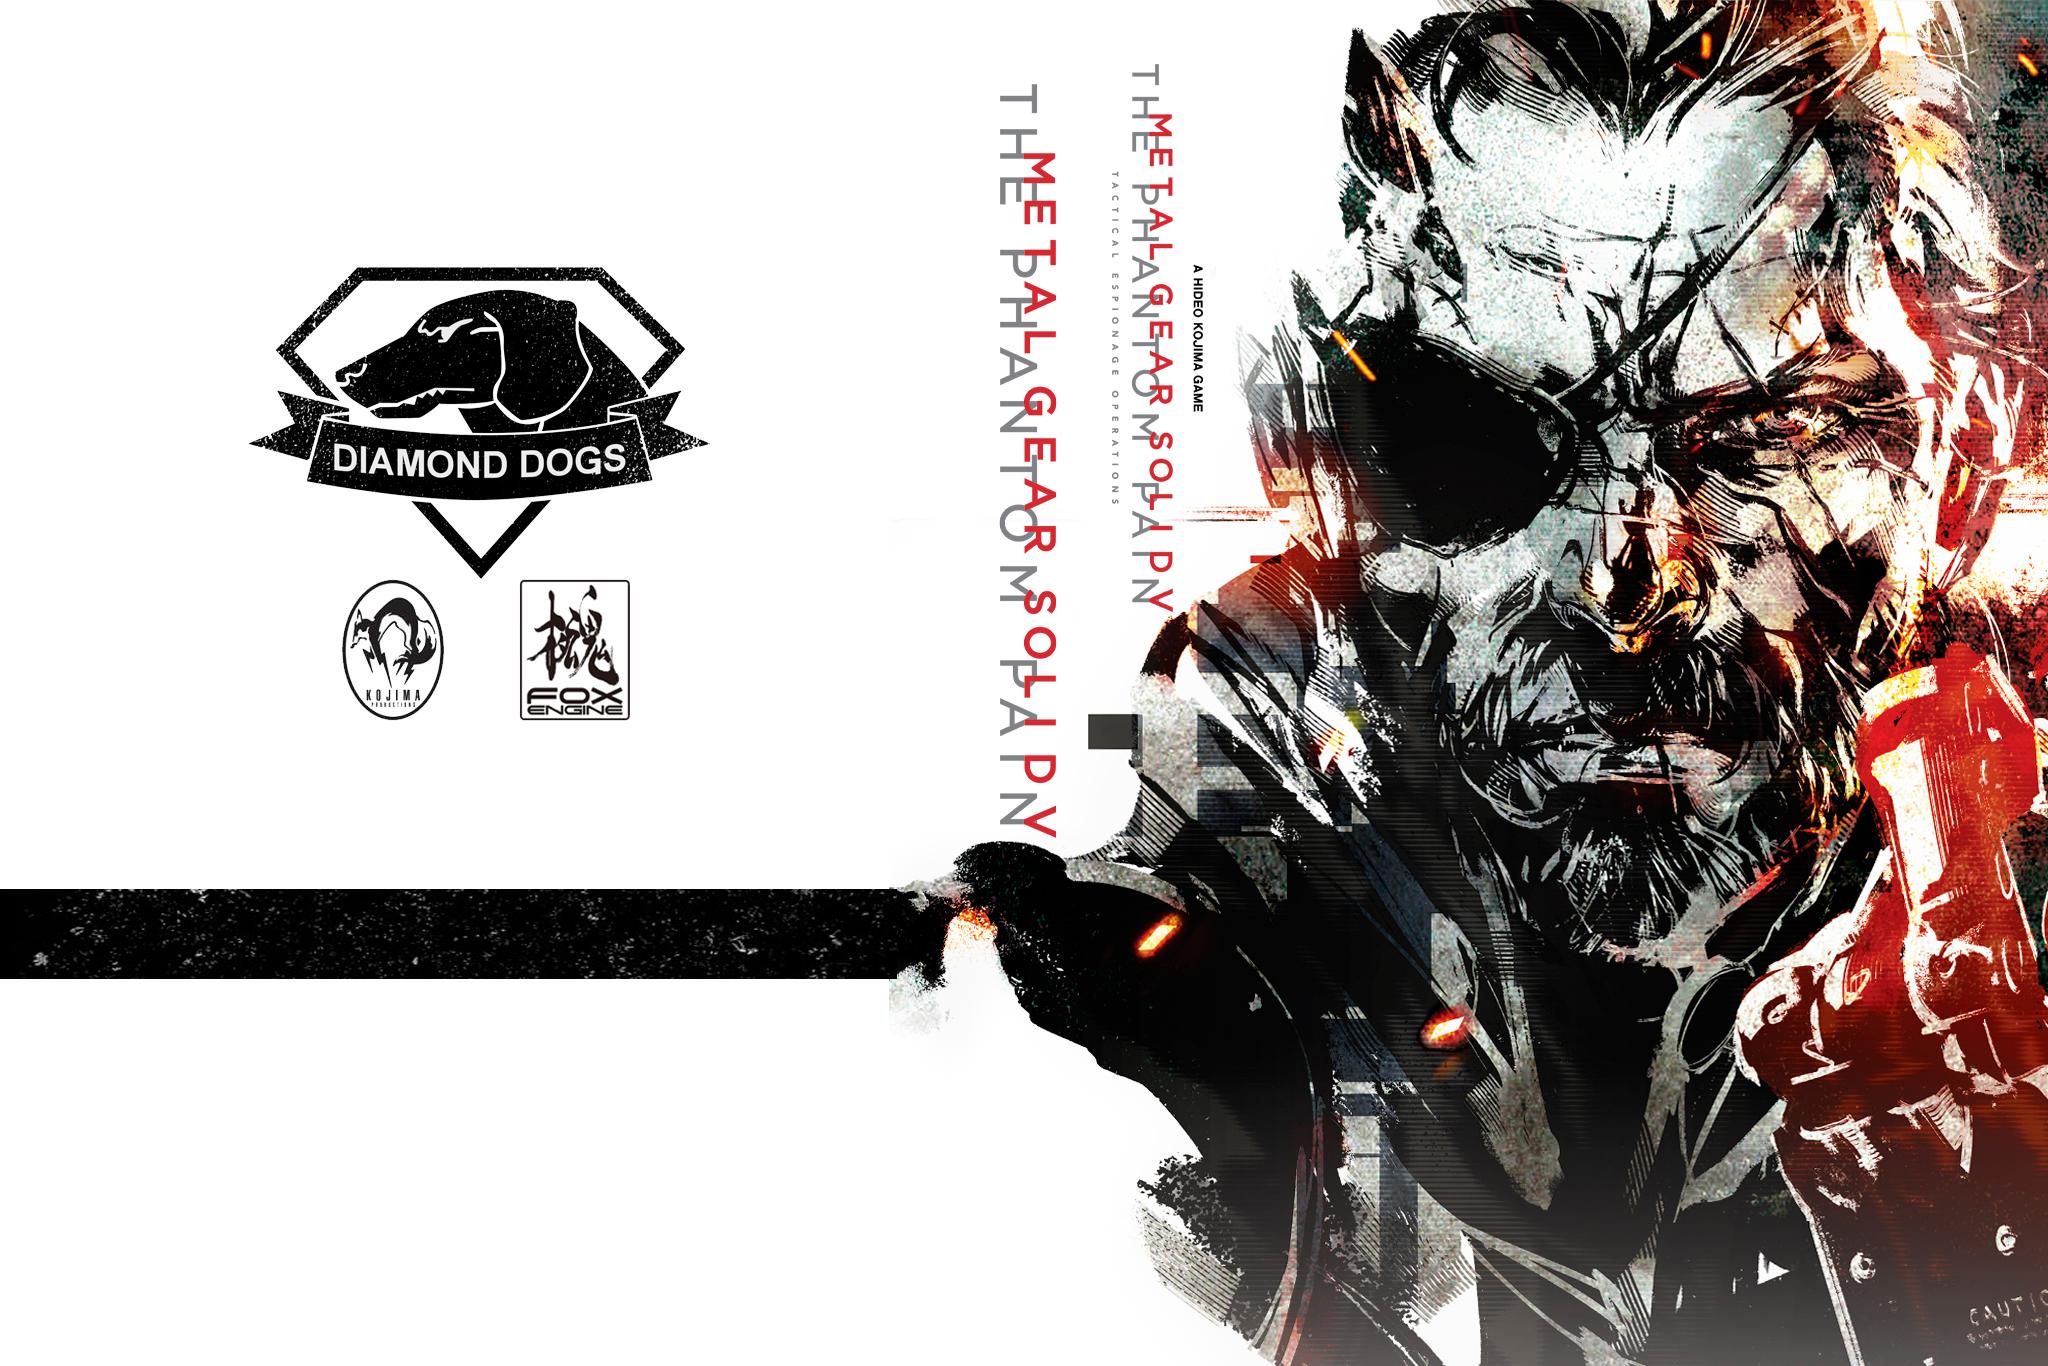 mgsv phantom pain shinkawa cover fan made by